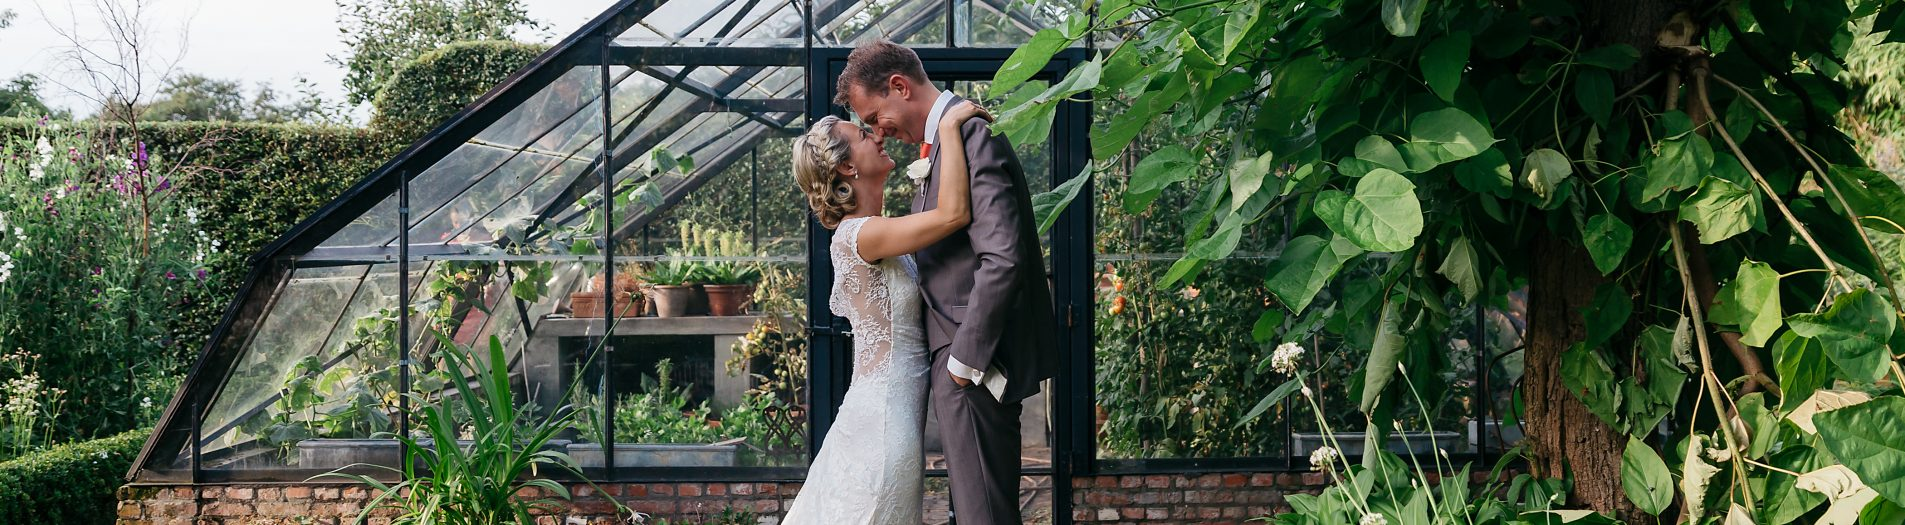 bruidsfotografie-bruidsreportage-trouwfotografie-trouwreportage